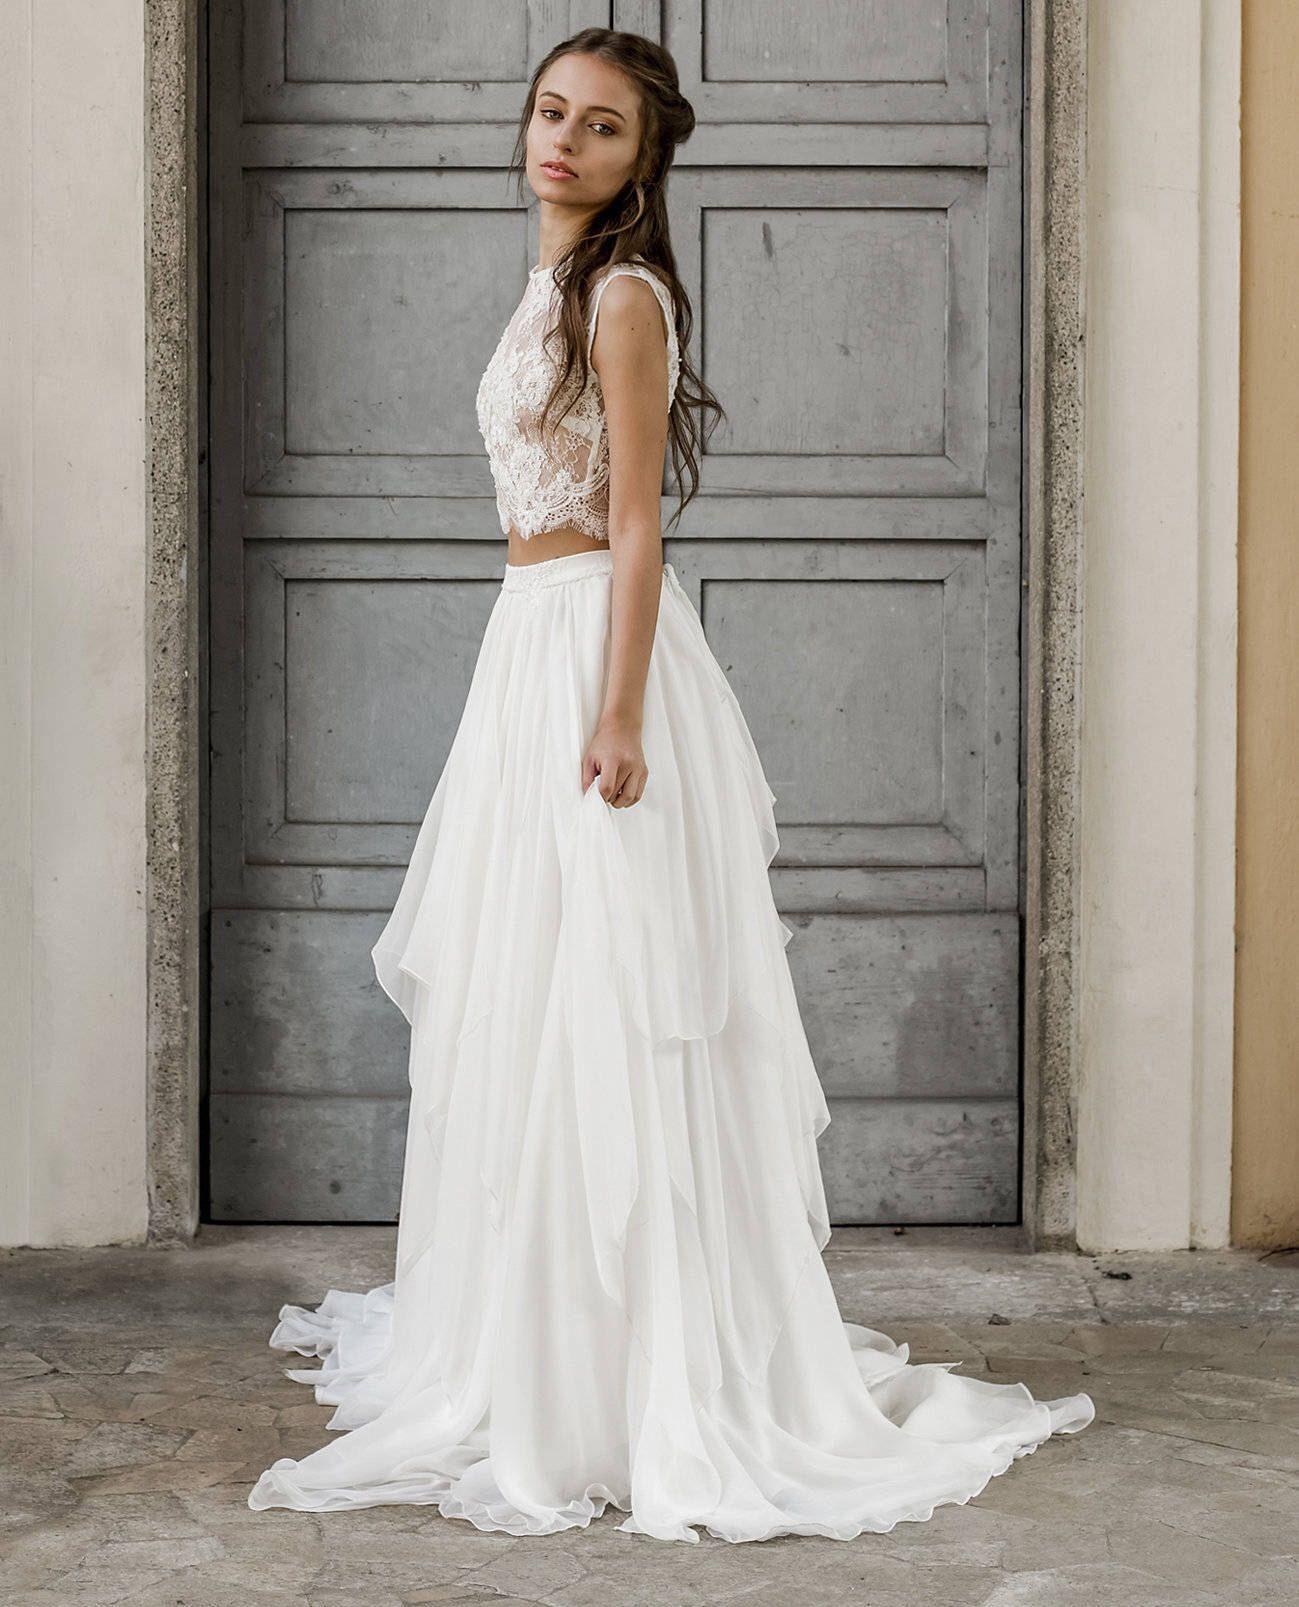 Wedding dresses com  Silk and lace wedding separates bridal separates  piece wedding